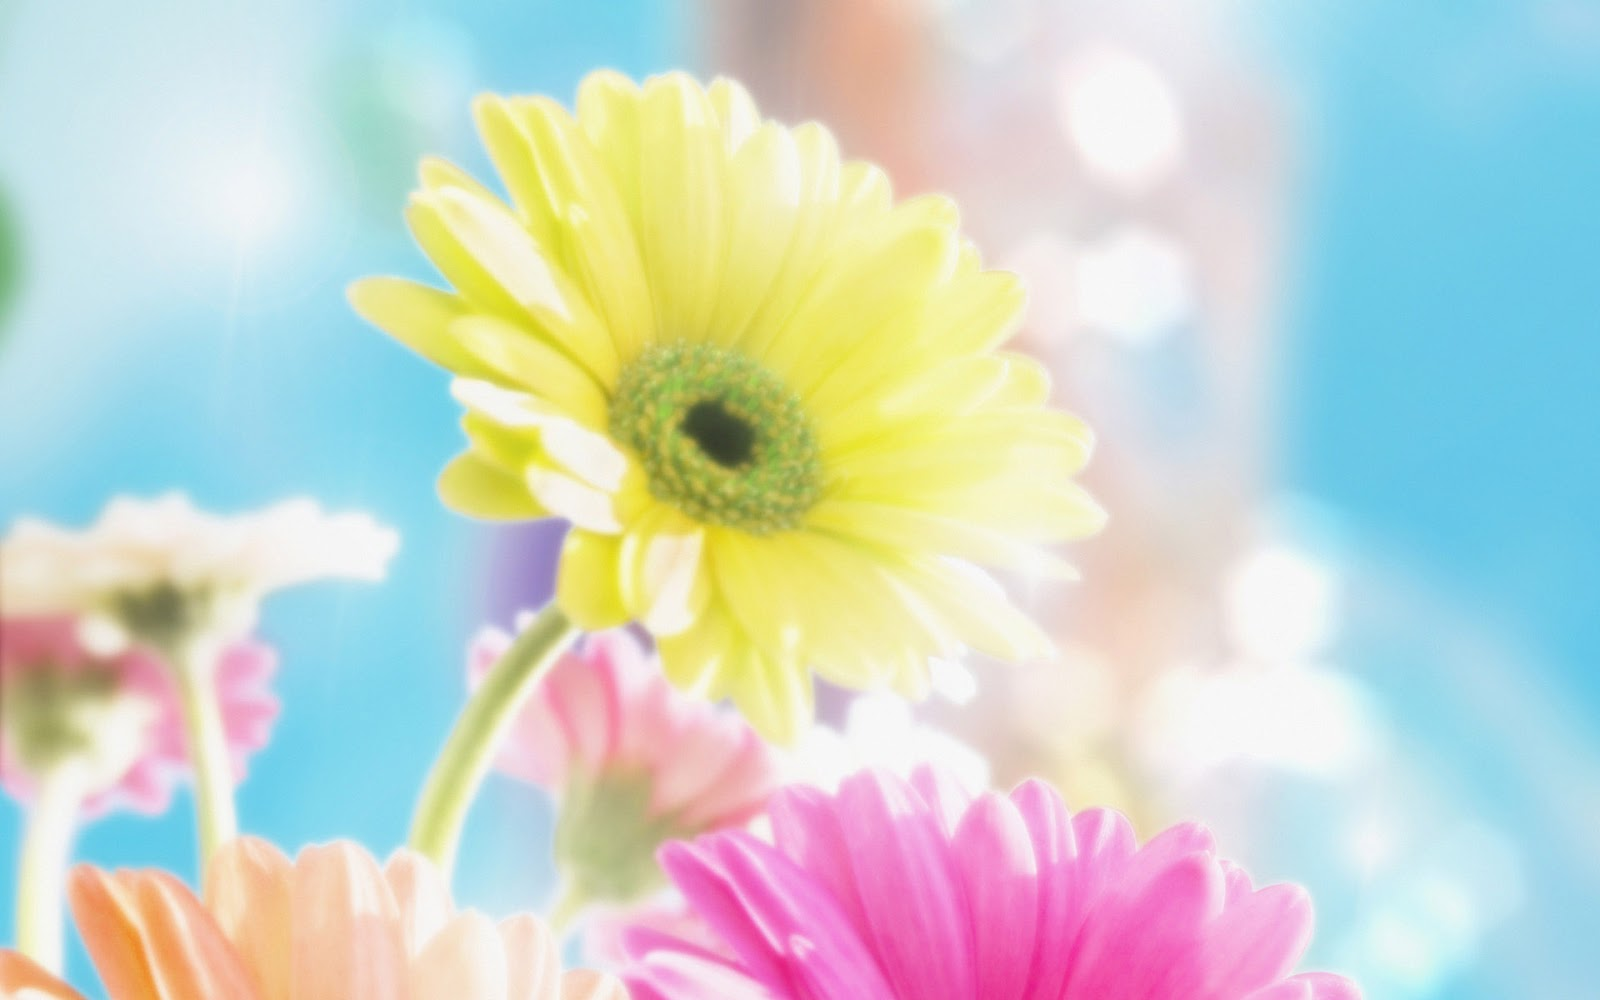 flowers for flower lovers Flowers background desktop wallpapers 1600x1000